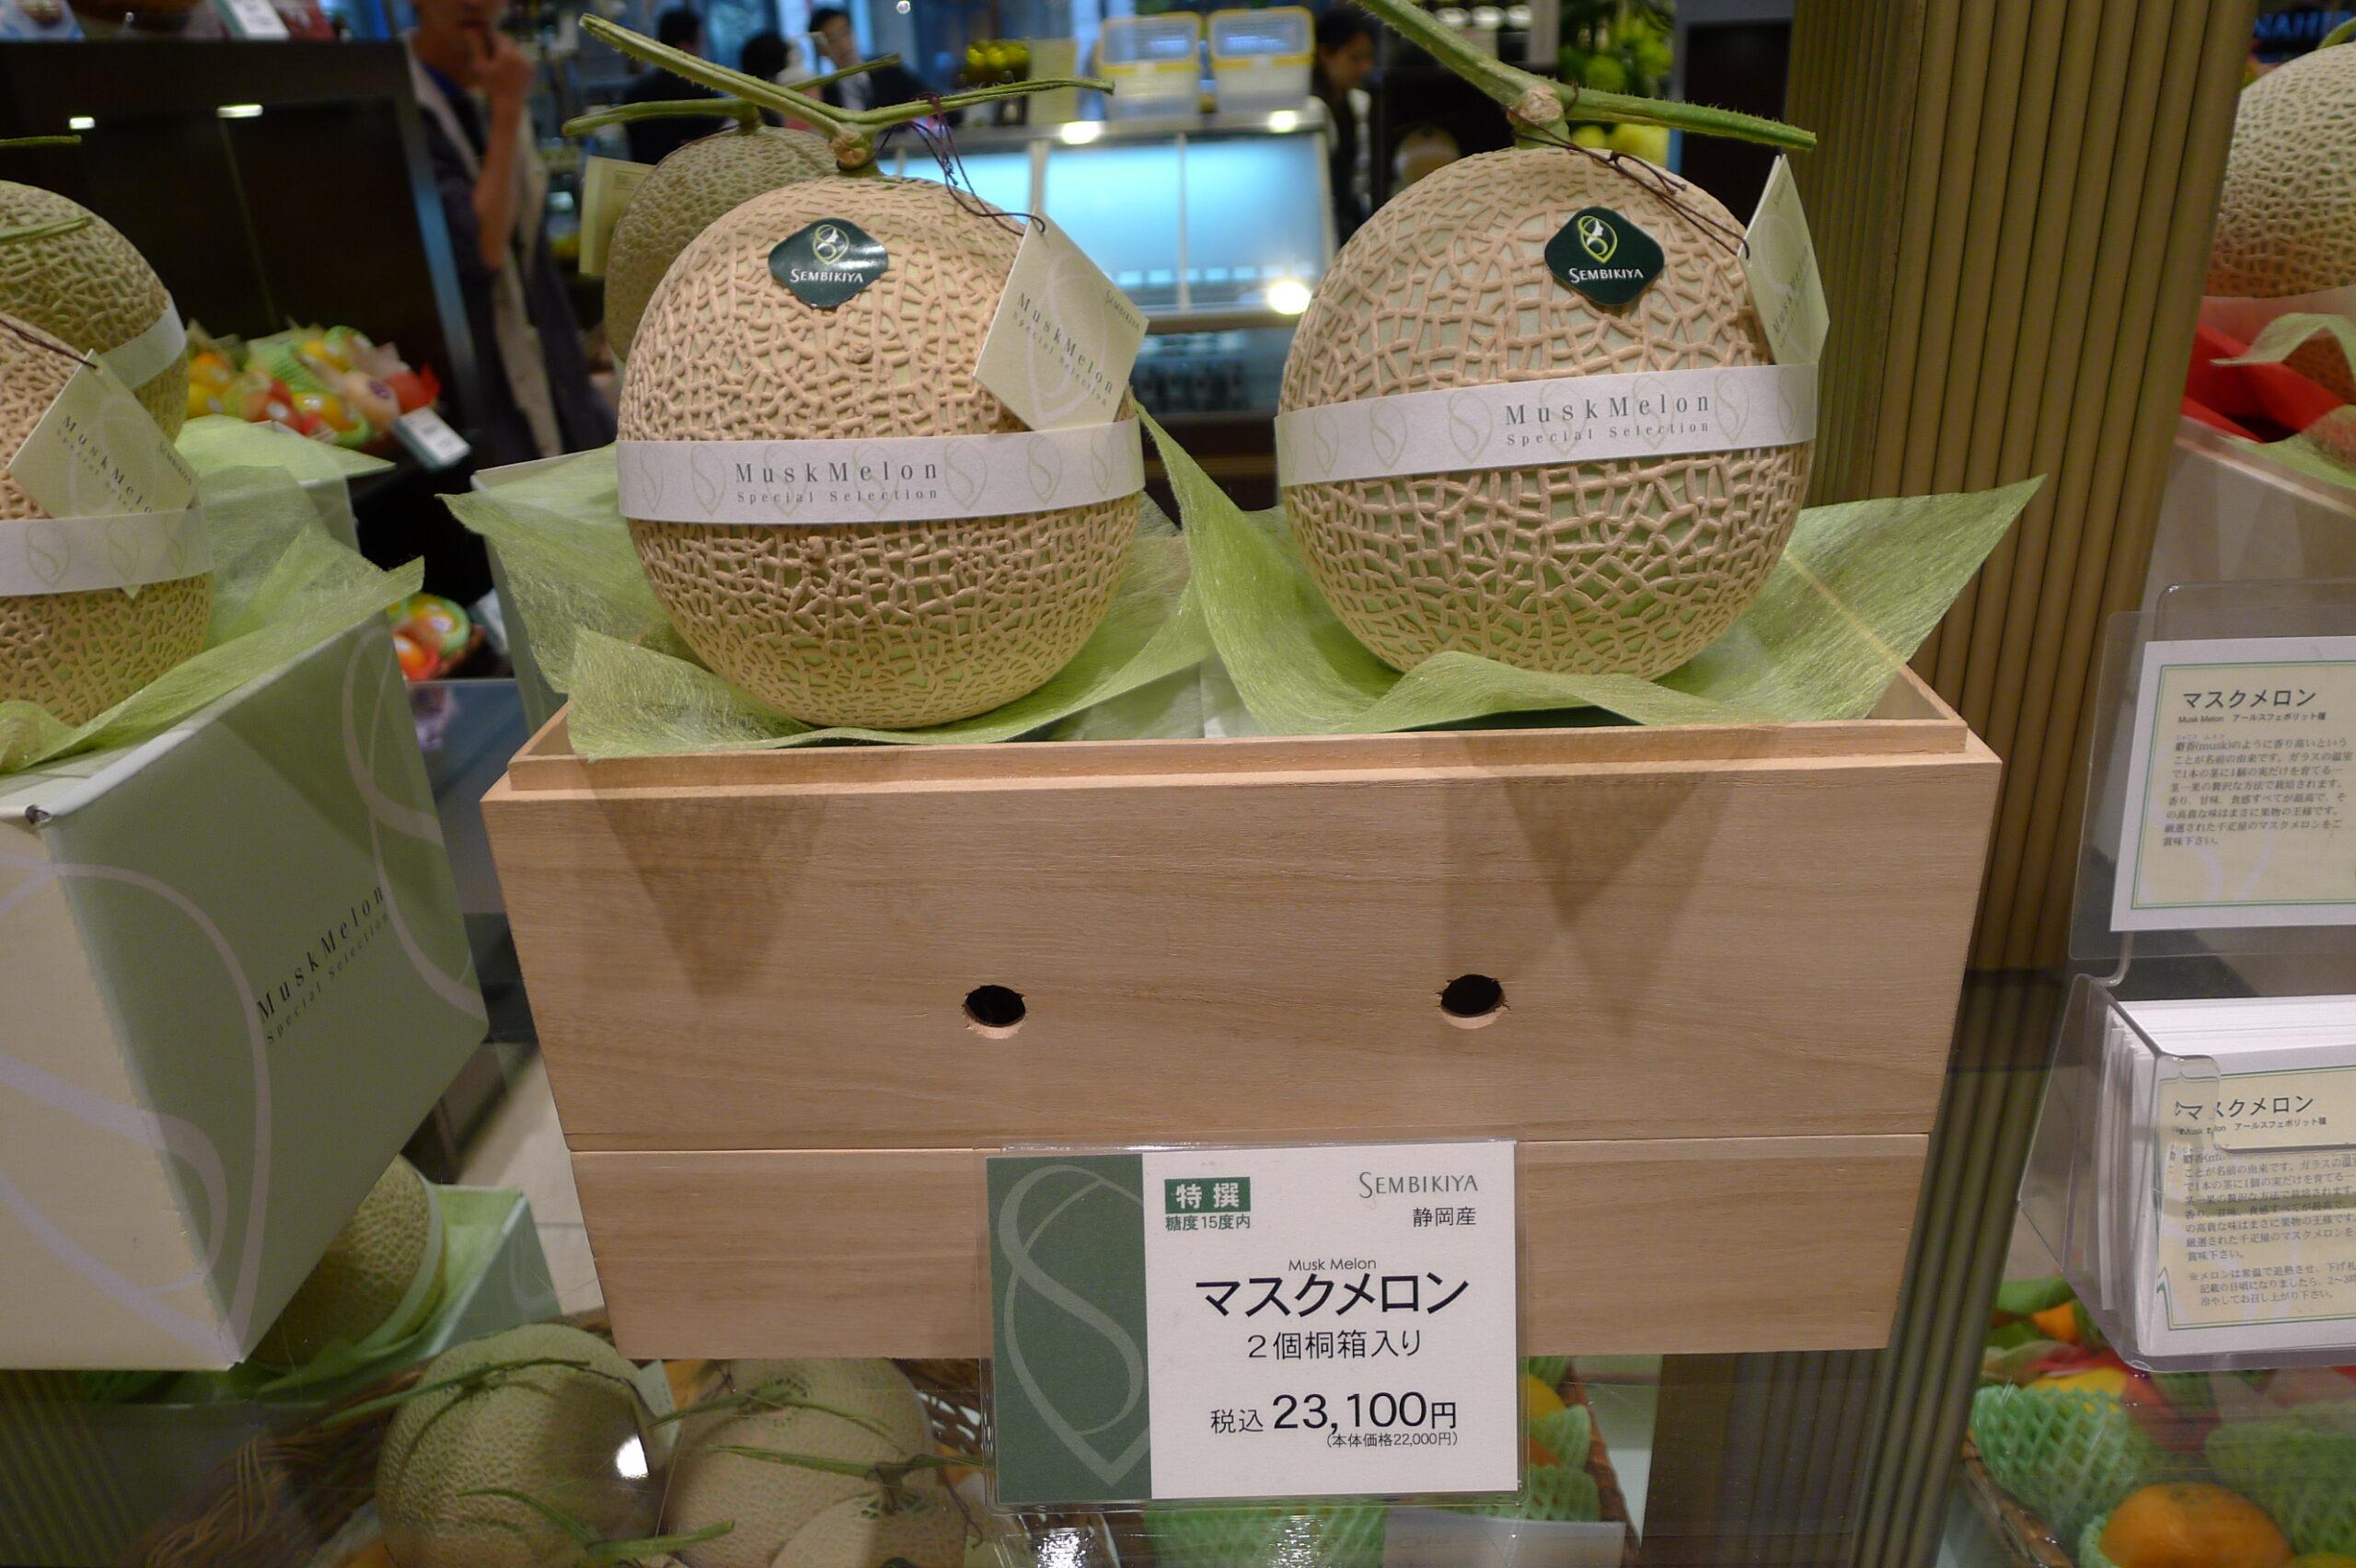 Sembikiya Muskmelon price, most expensive fruits